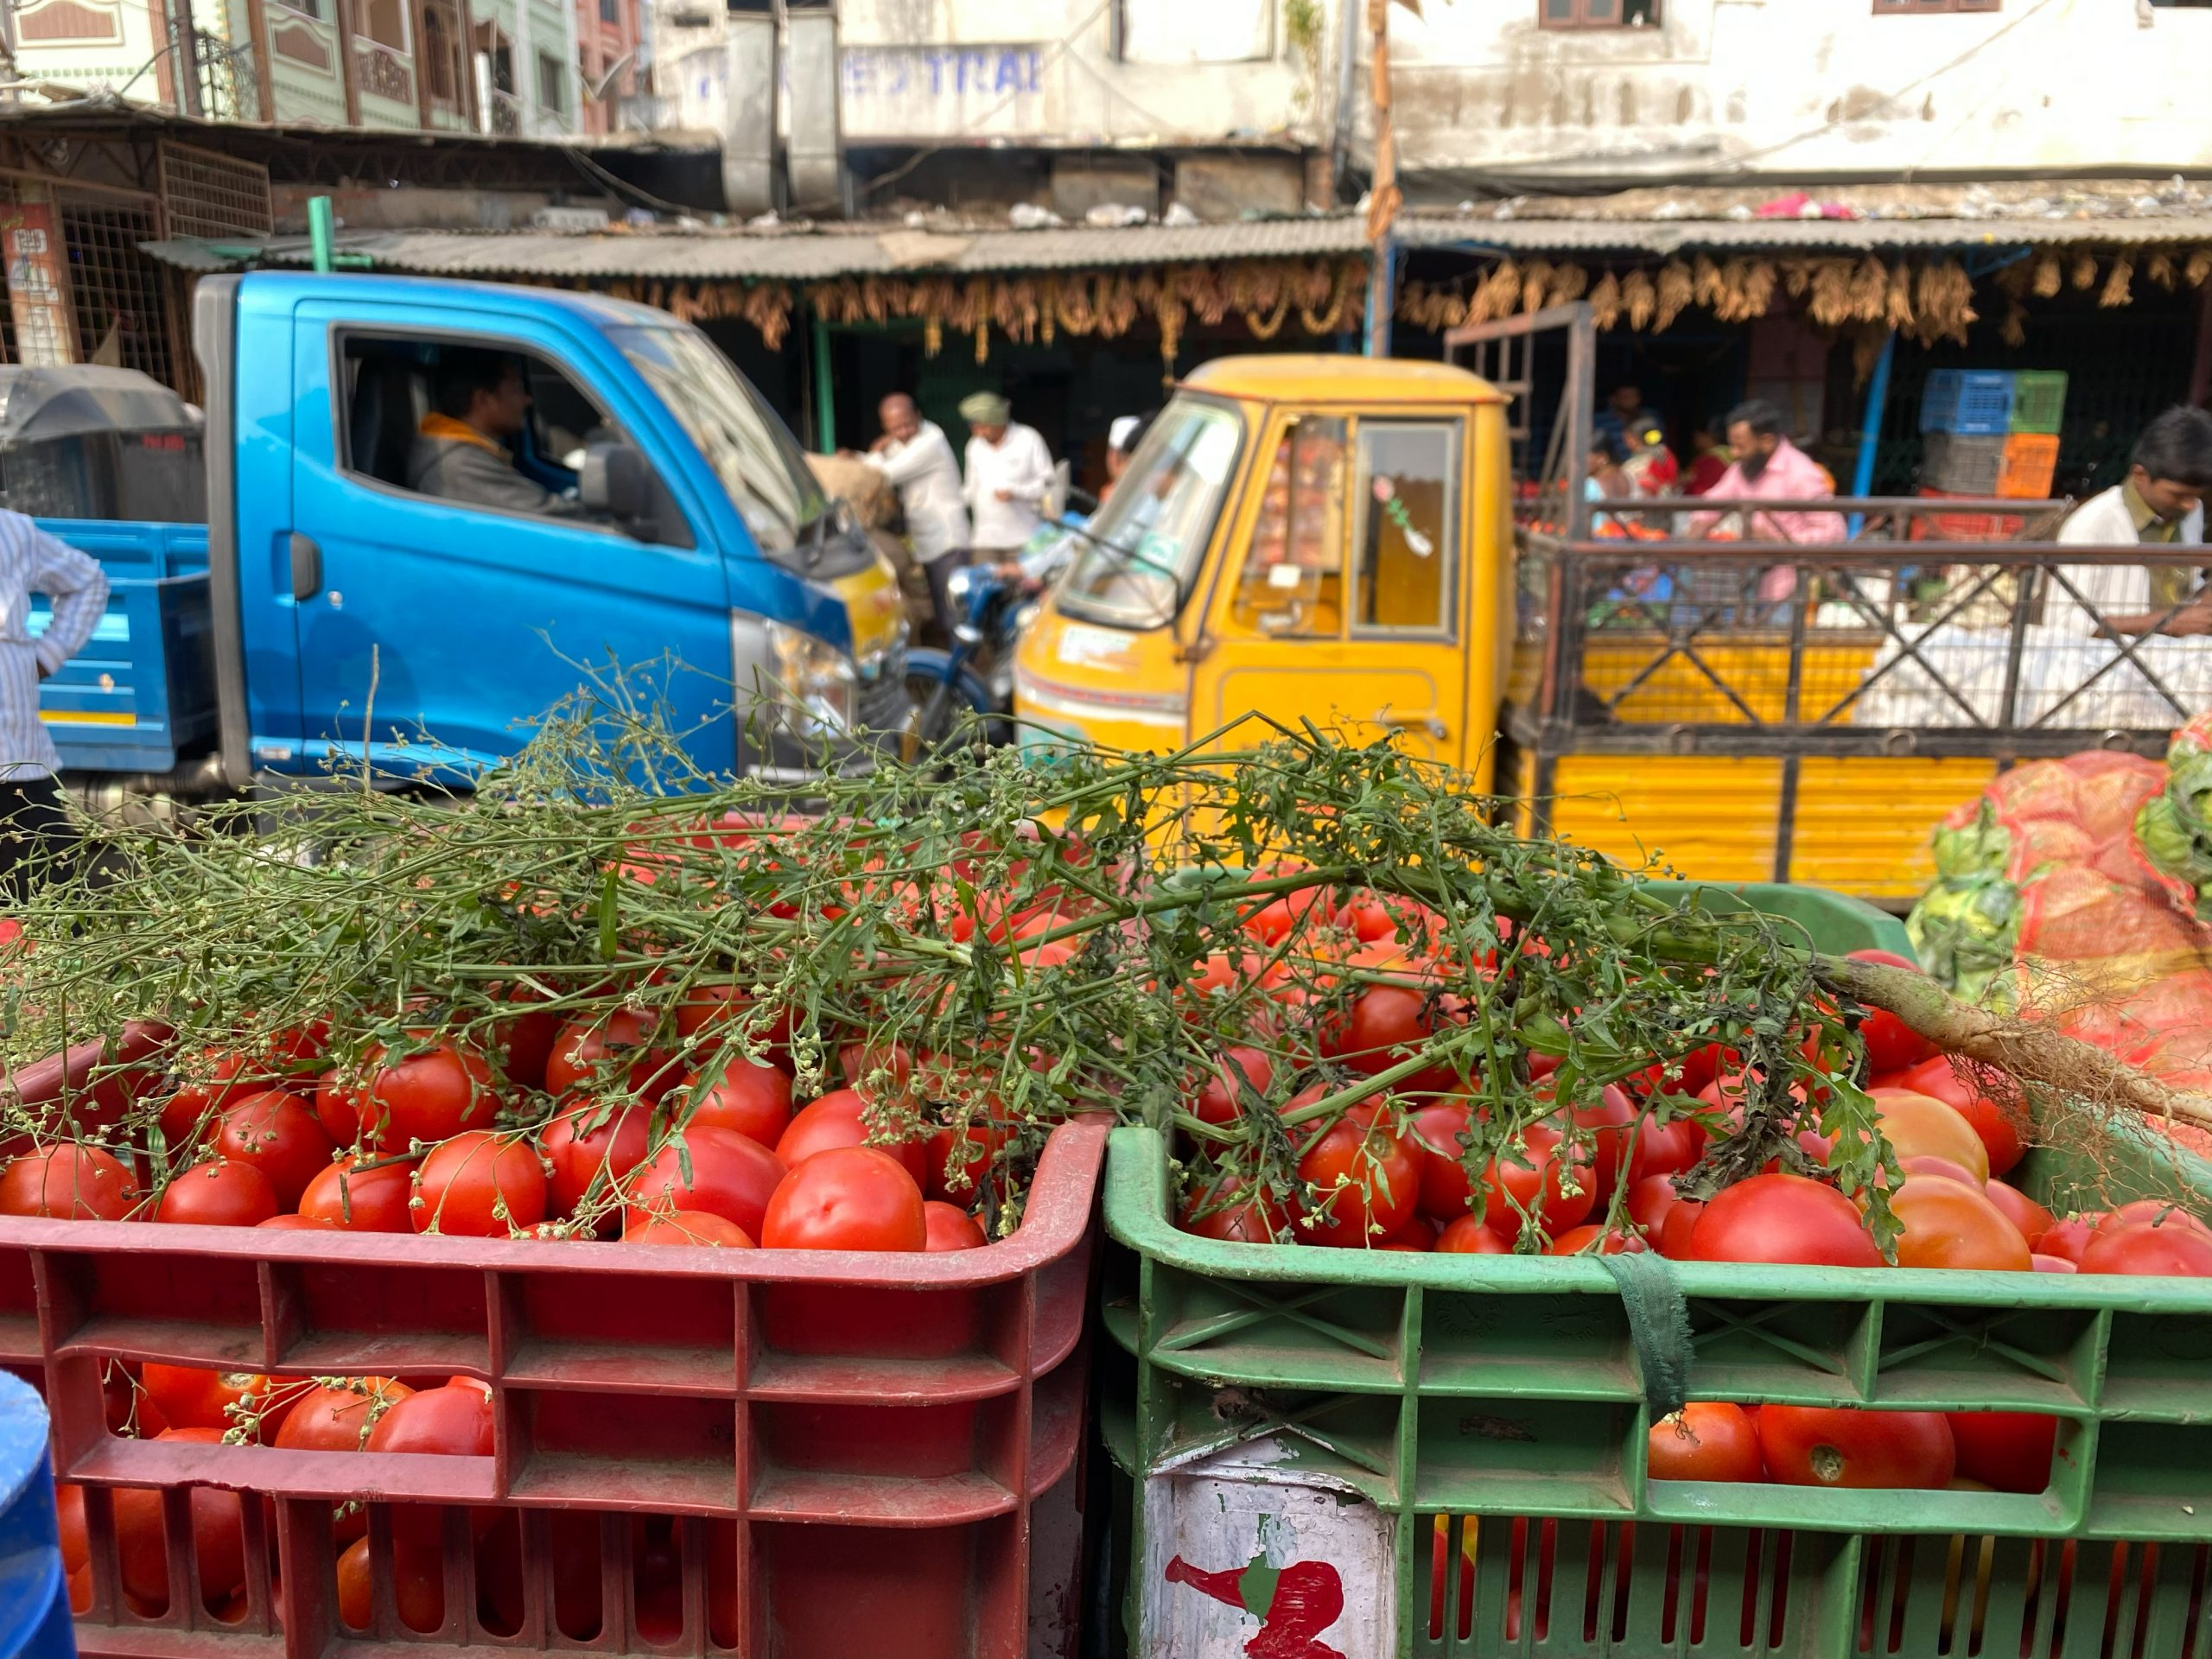 bins of tomatos